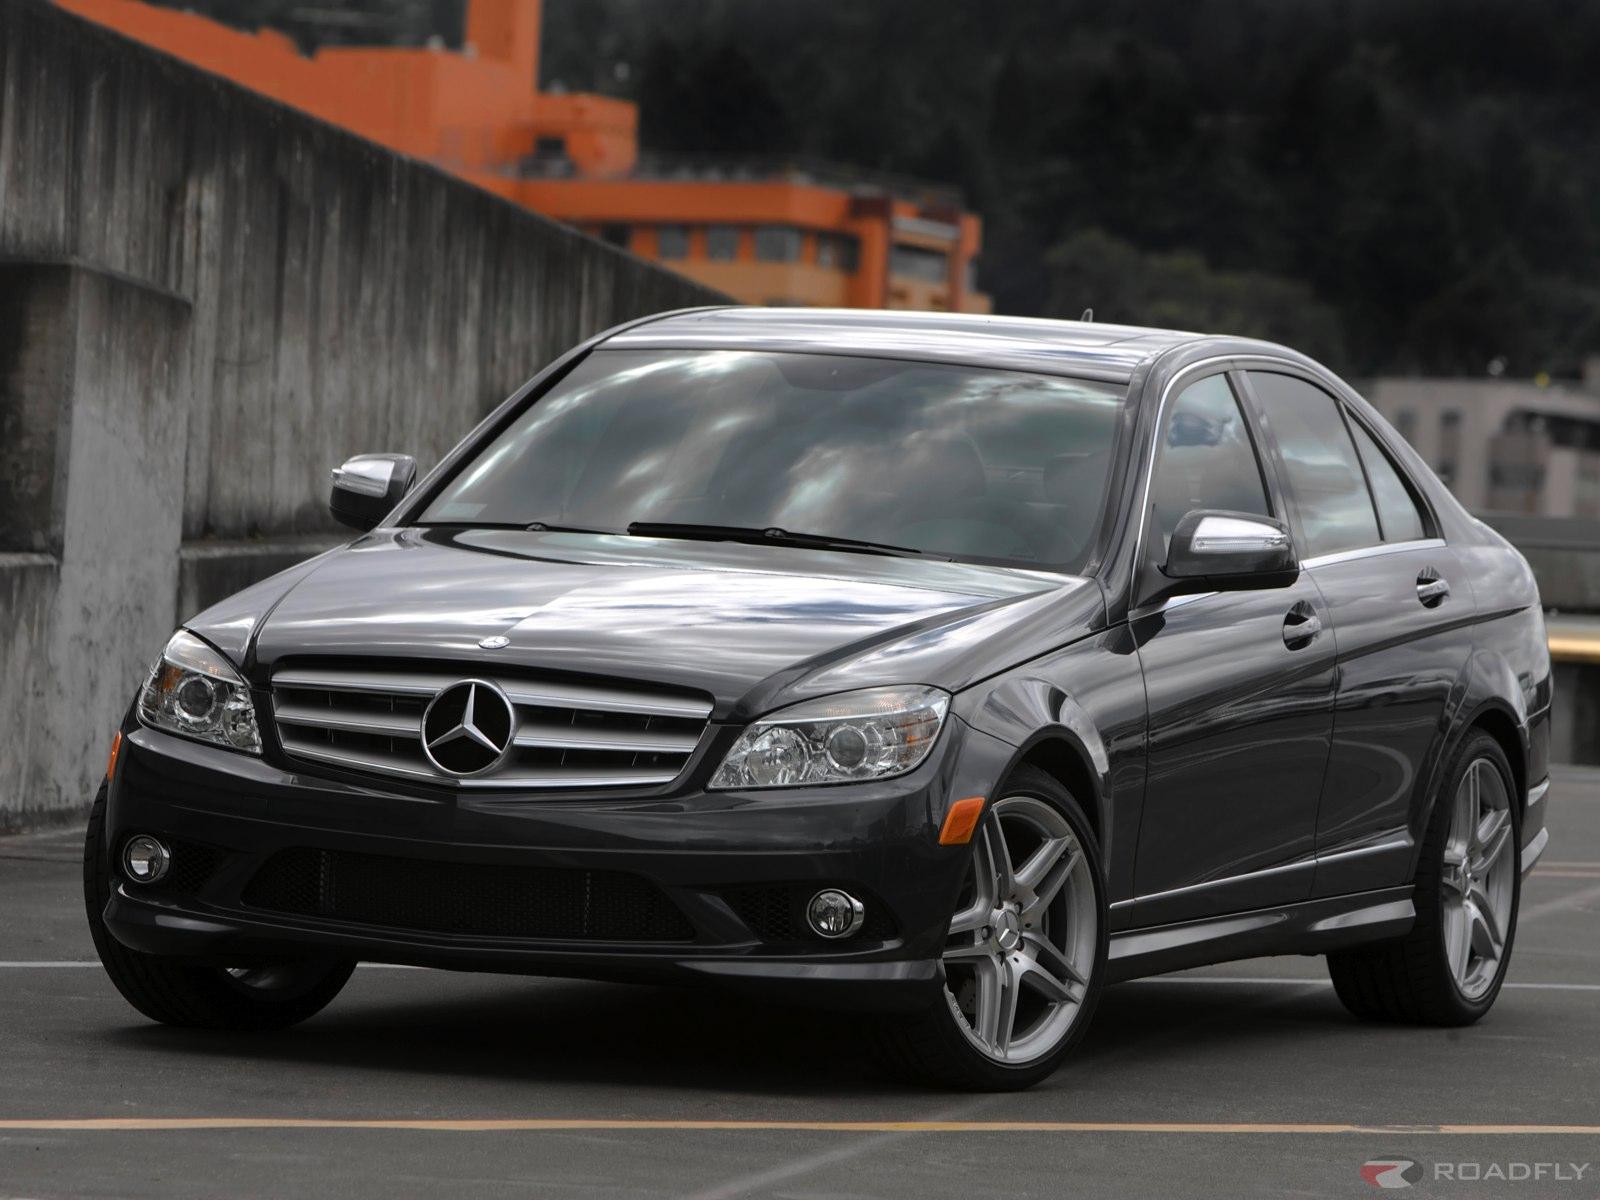 Mercedes benz c 350 photos 2 on better parts ltd for Mercedes benz dealer parts